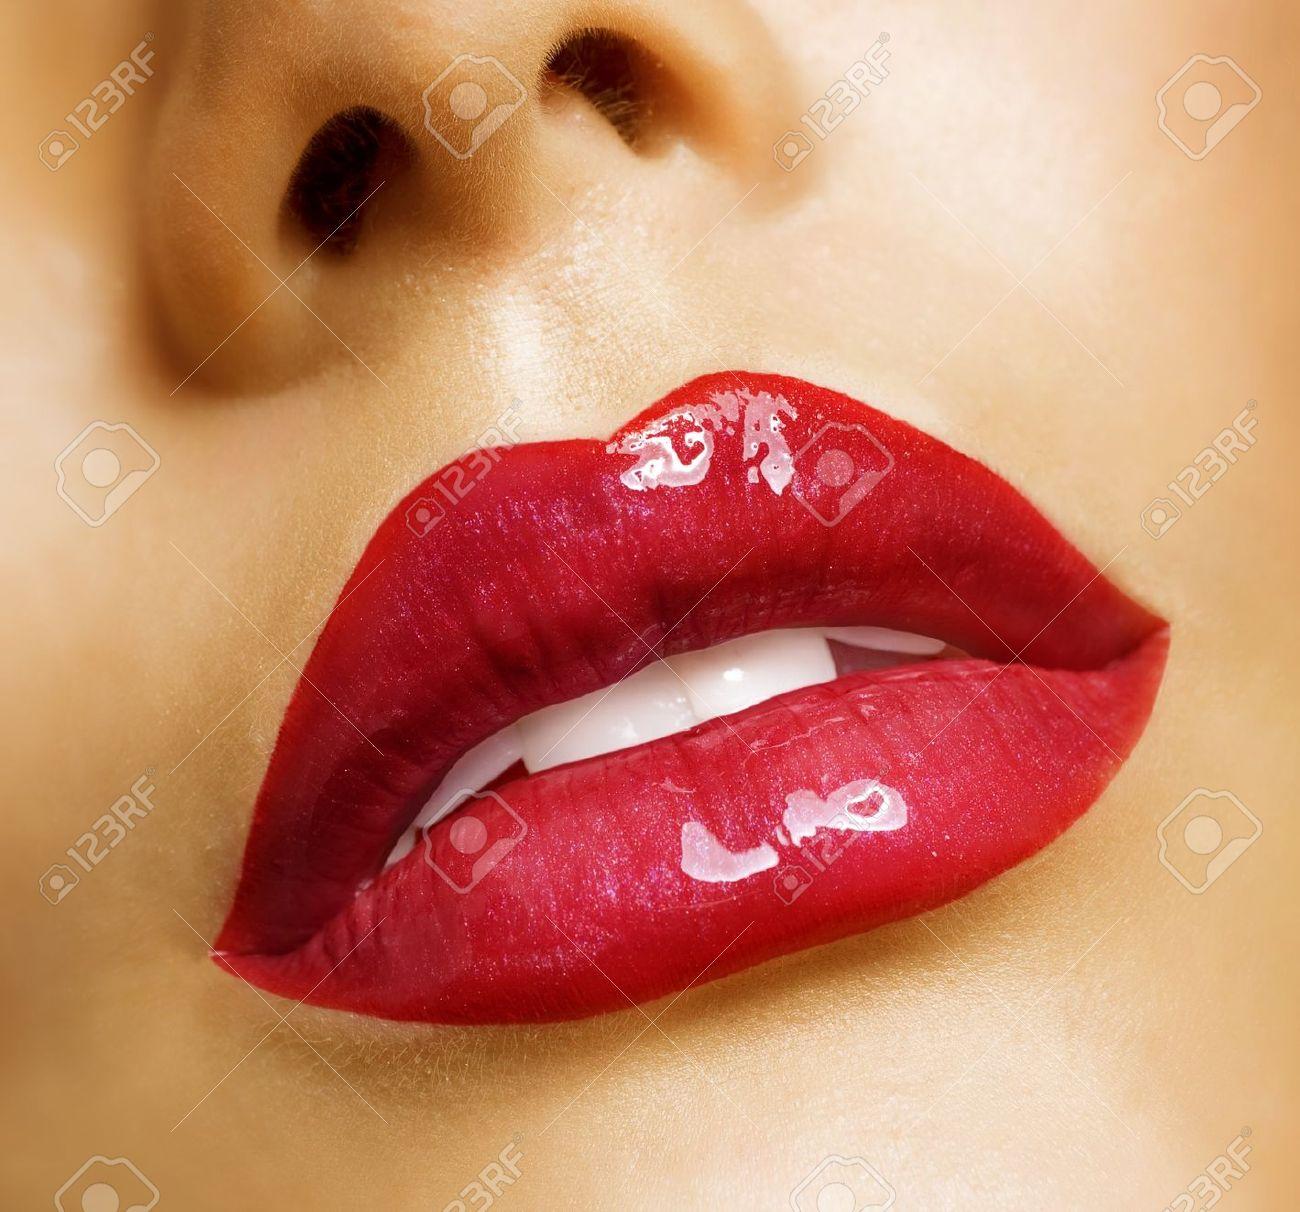 Sensual mouth. Red lipstick Stock Photo - 9539615